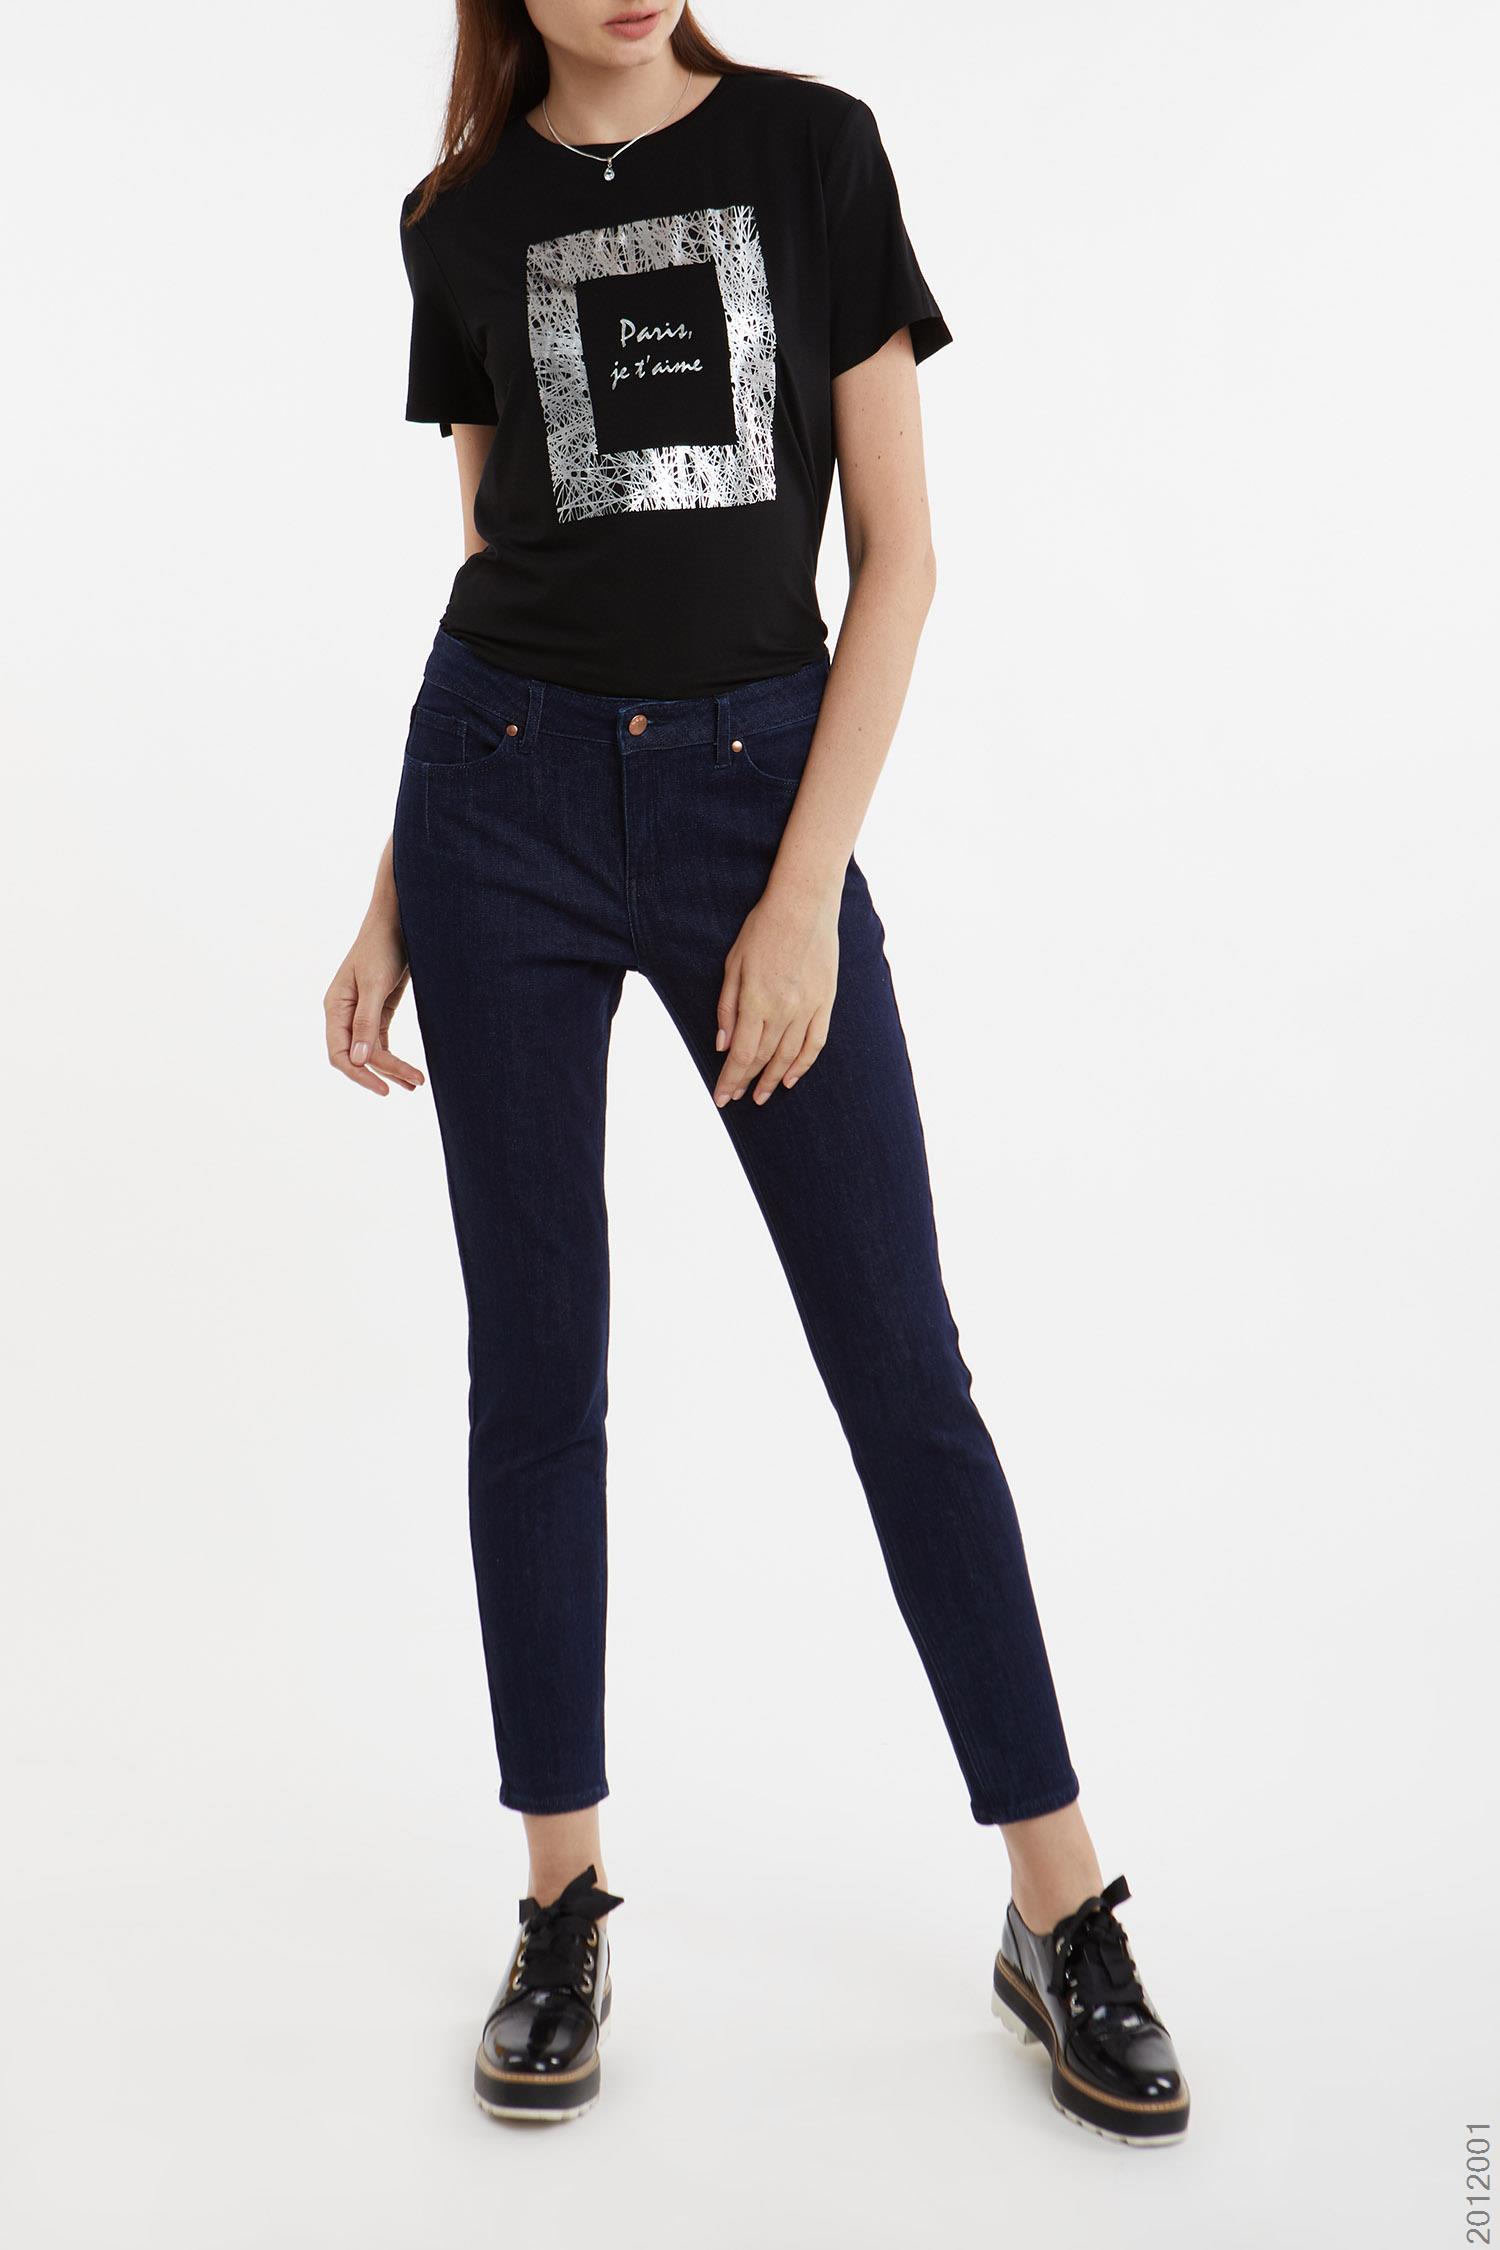 quần jean nữ - 2012001